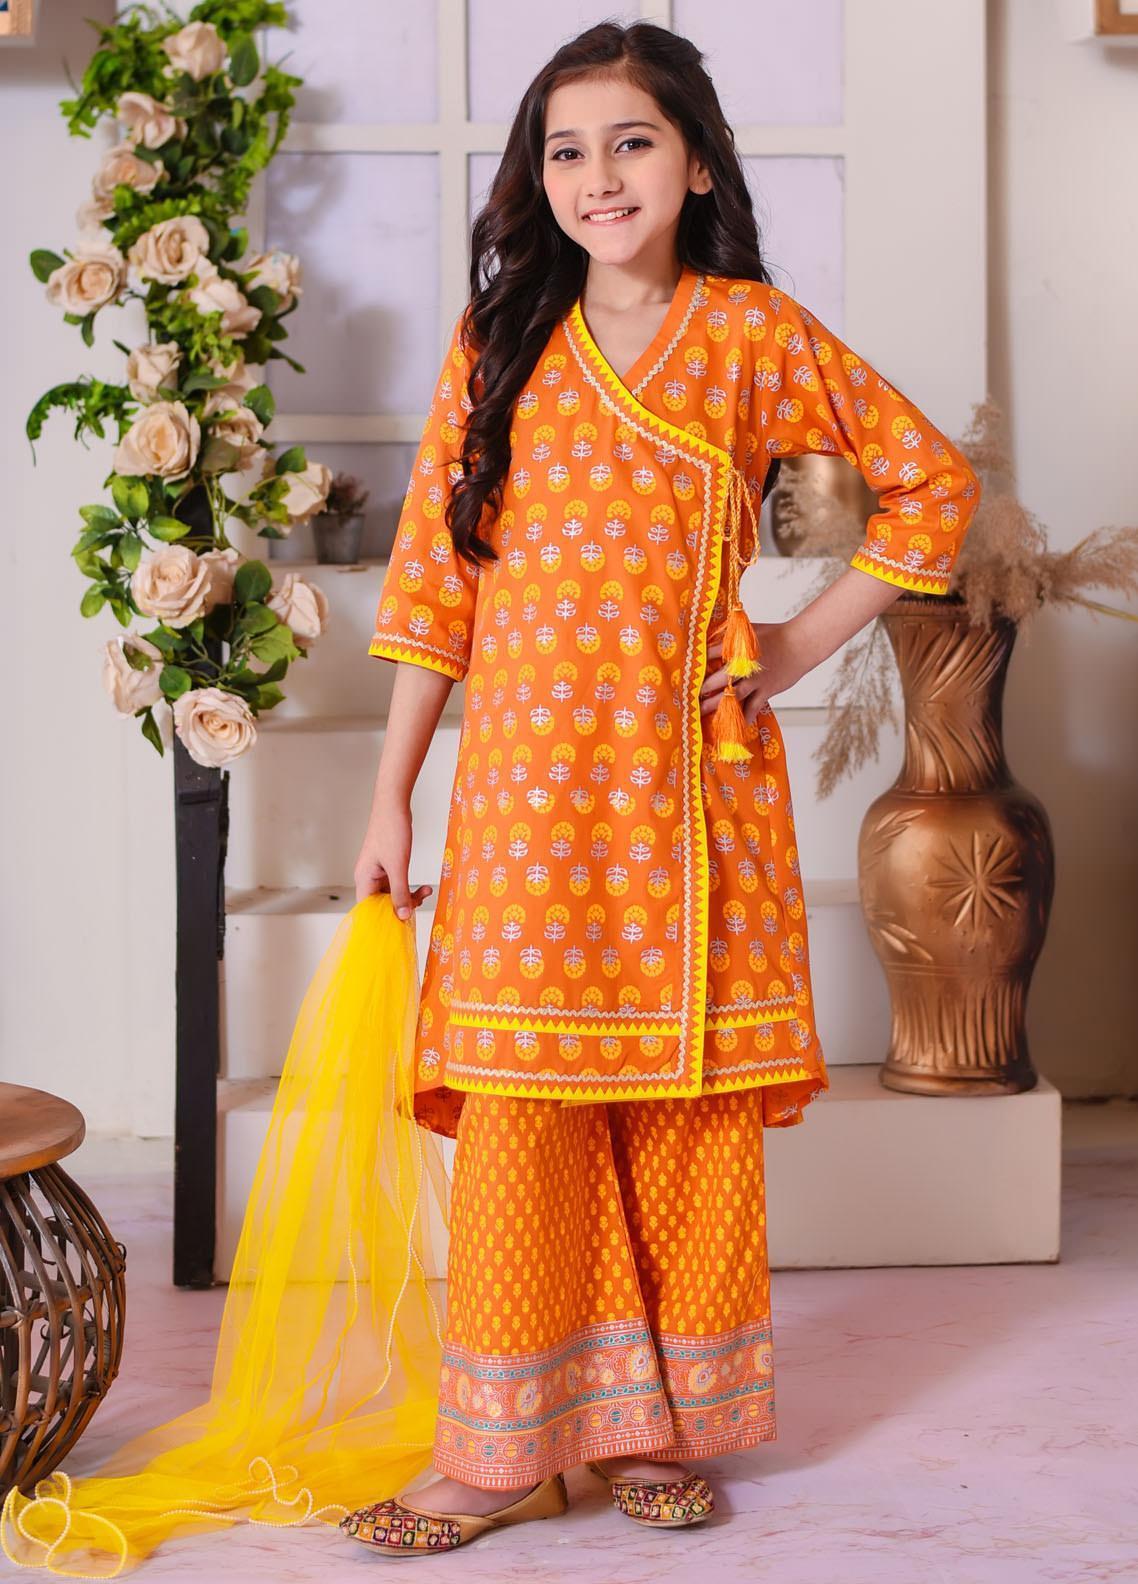 Ochre Cotton Fancy 3 Piece for Girls -  OFK-769 Orange